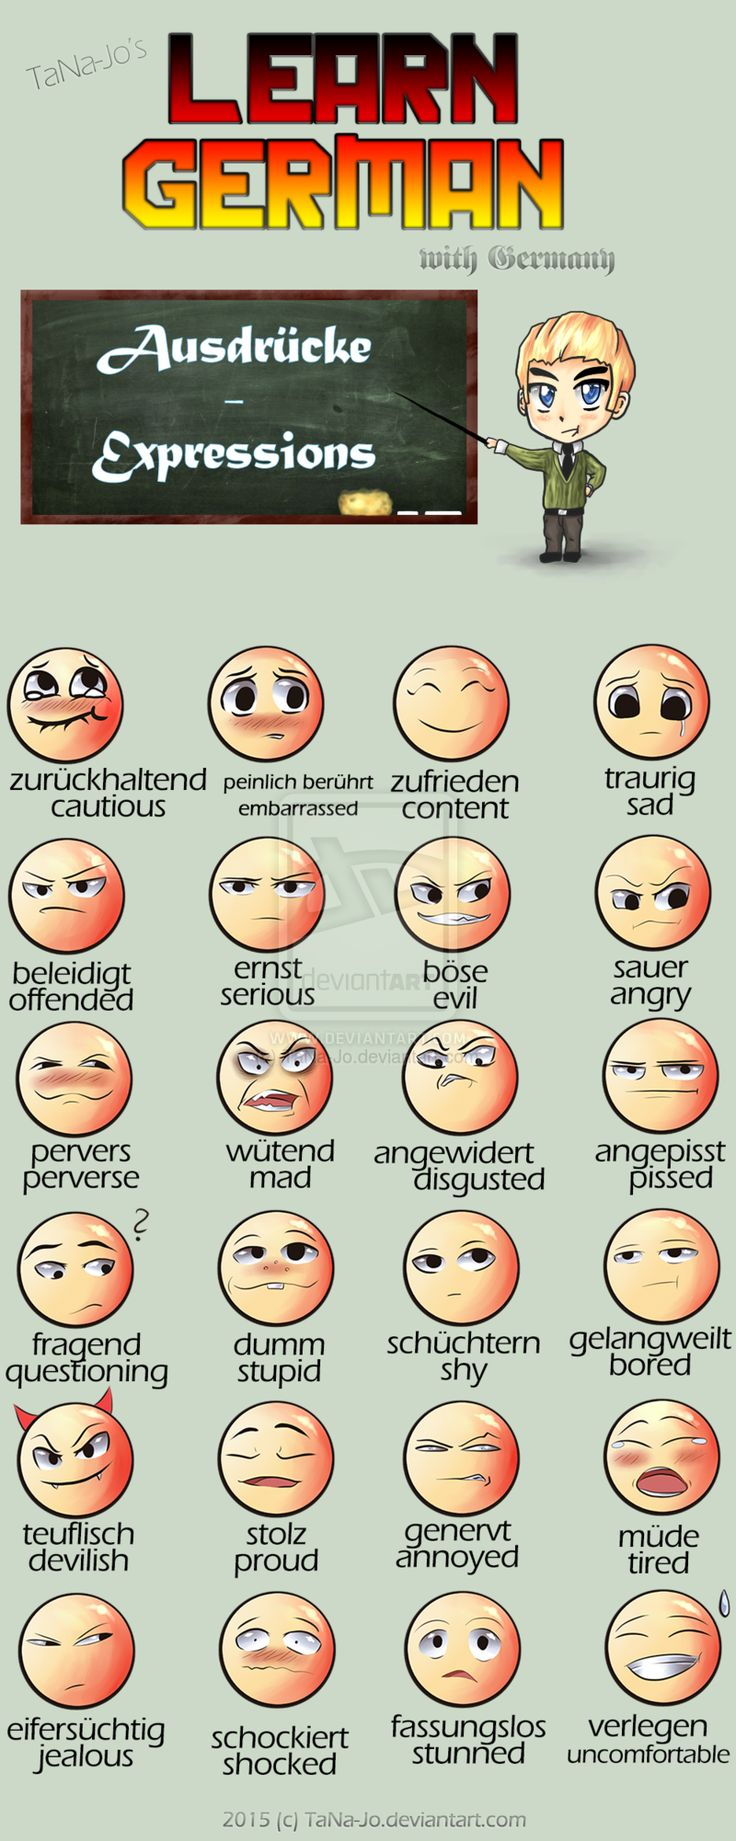 Learn German - Smileys by TaNa-Jo.deviantart.com on @DeviantArt